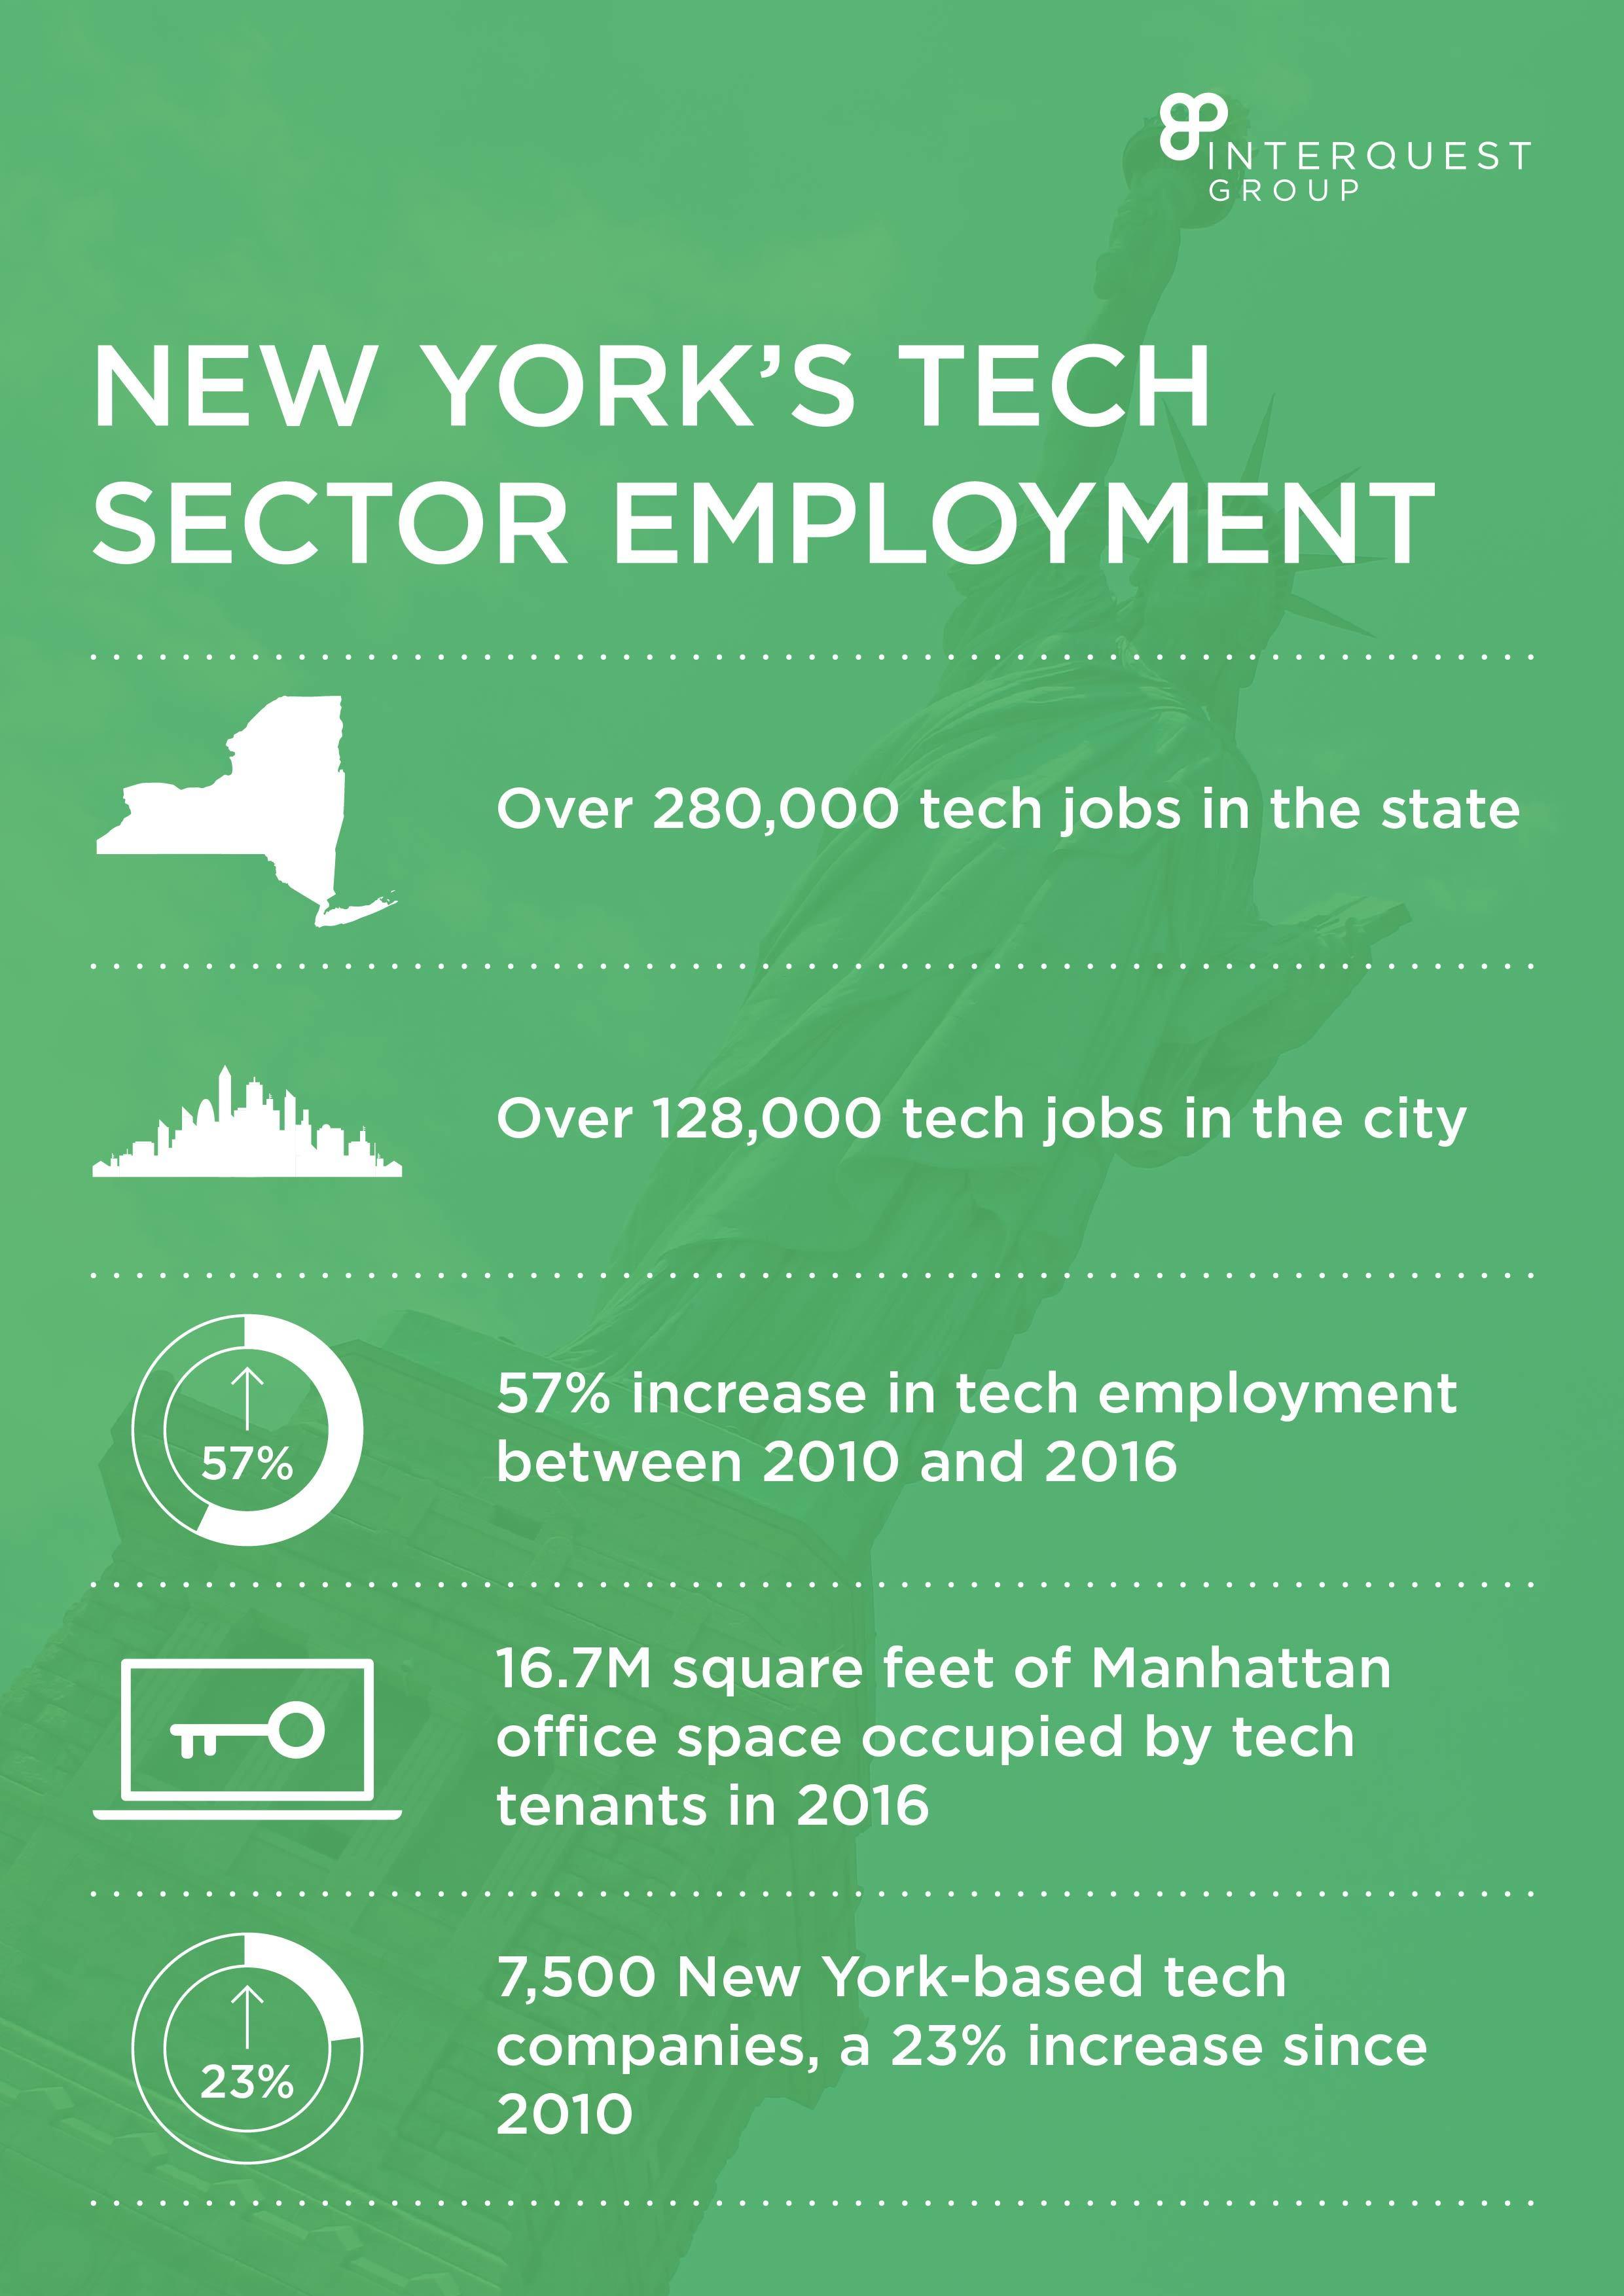 New York's Tech Sector Employment Growth